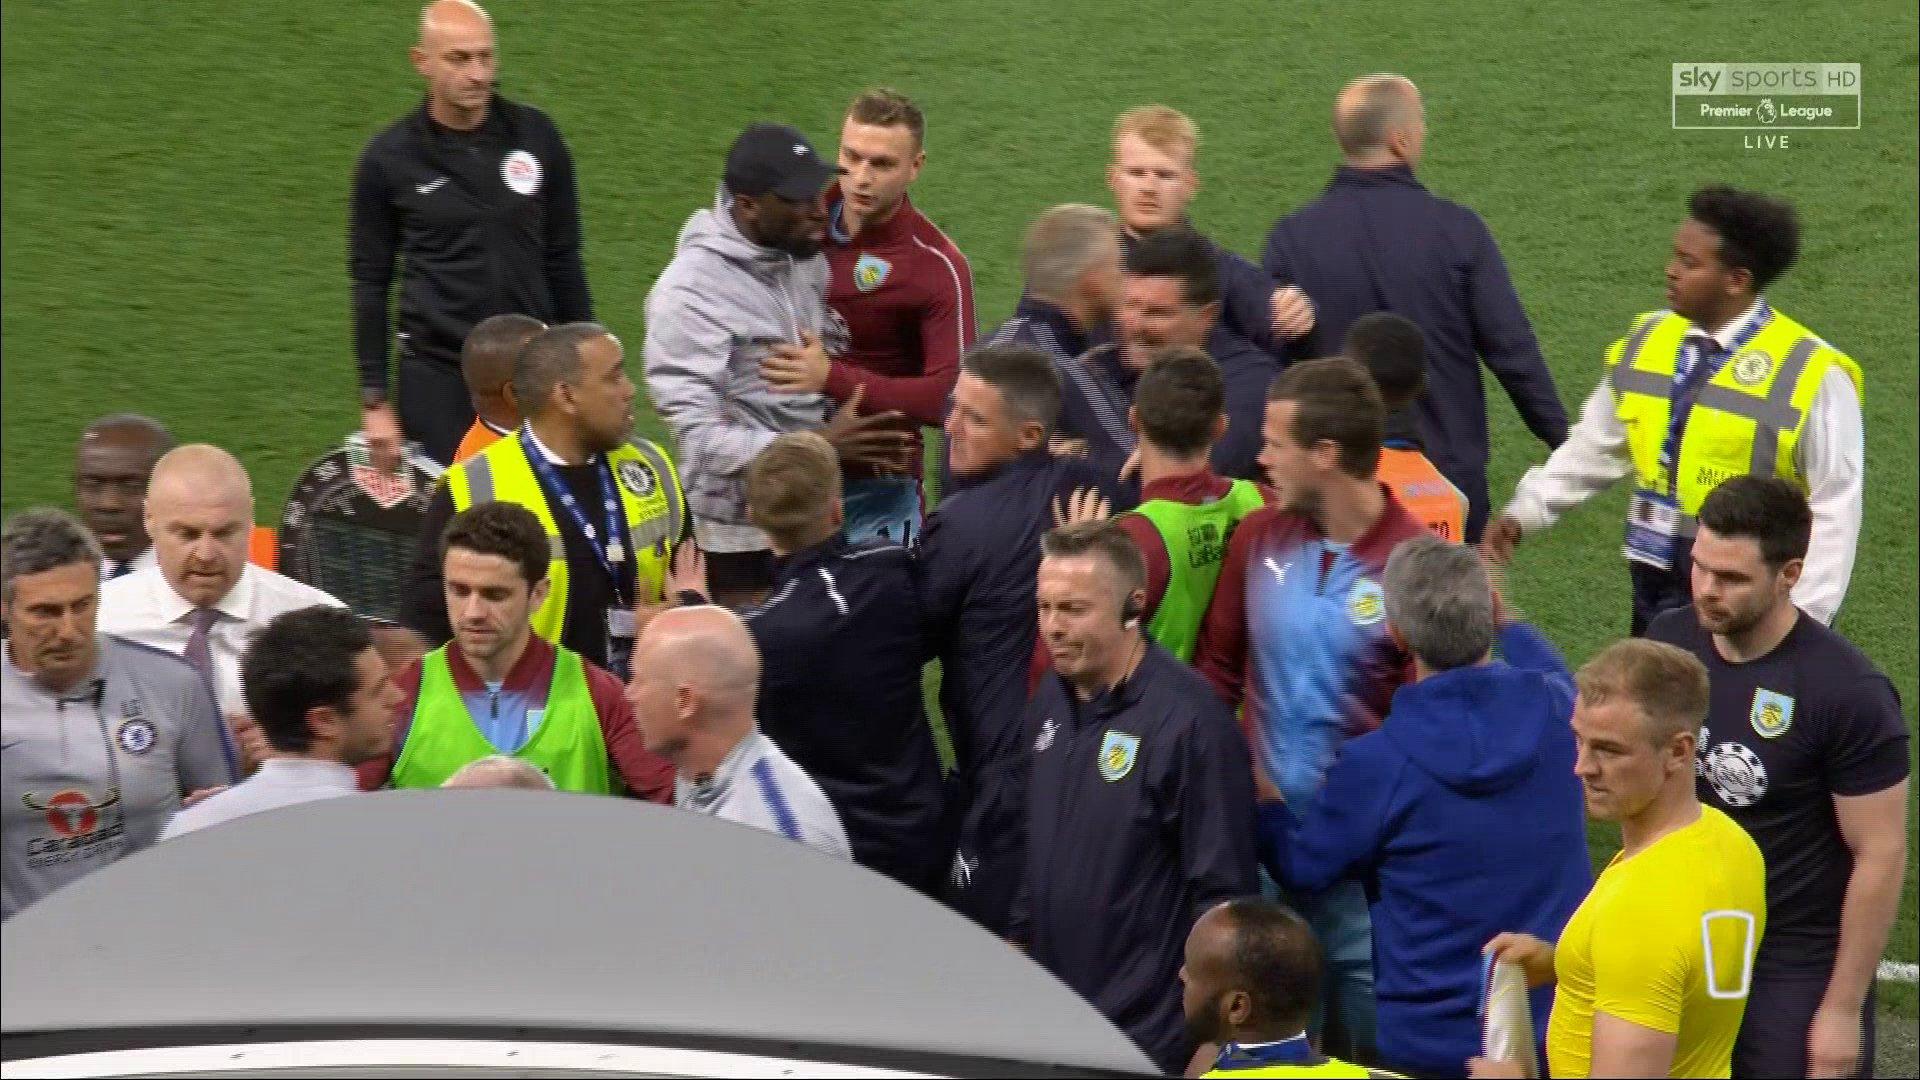 What Burnley said to Chelsea boss Maurizio Sarri to spark melee